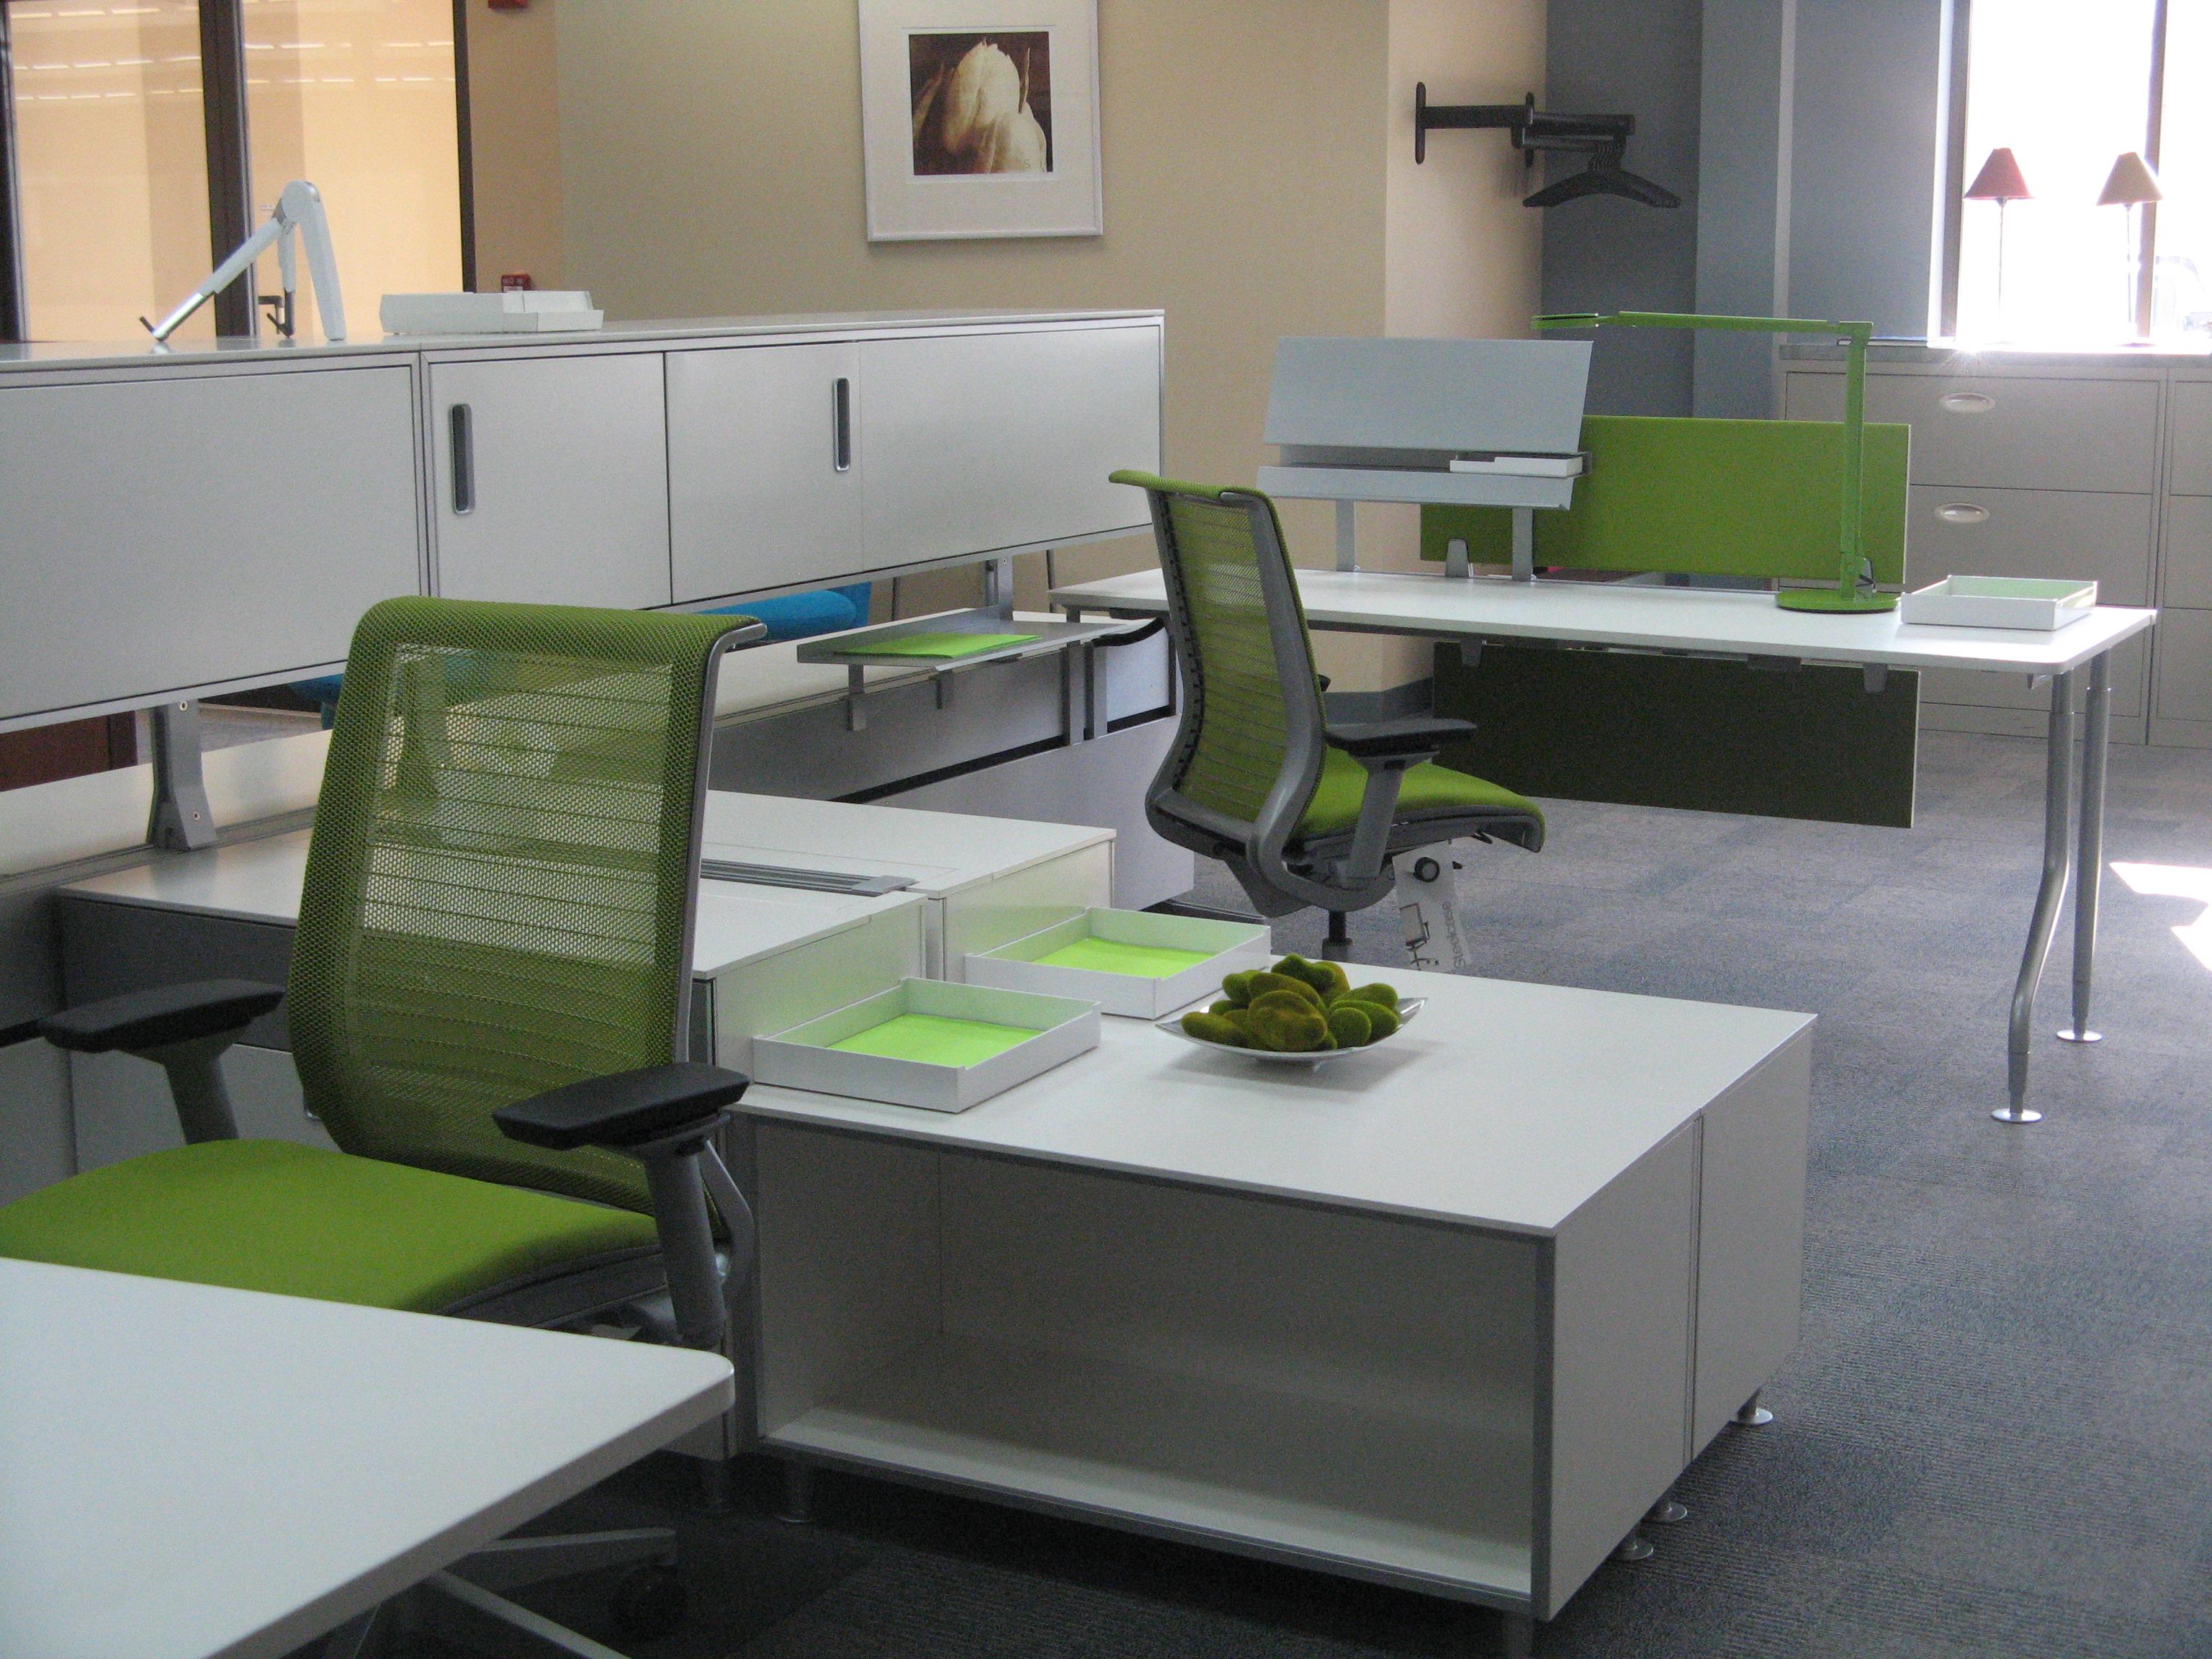 Local commercial interior design decorating and furniture for Interior designer address